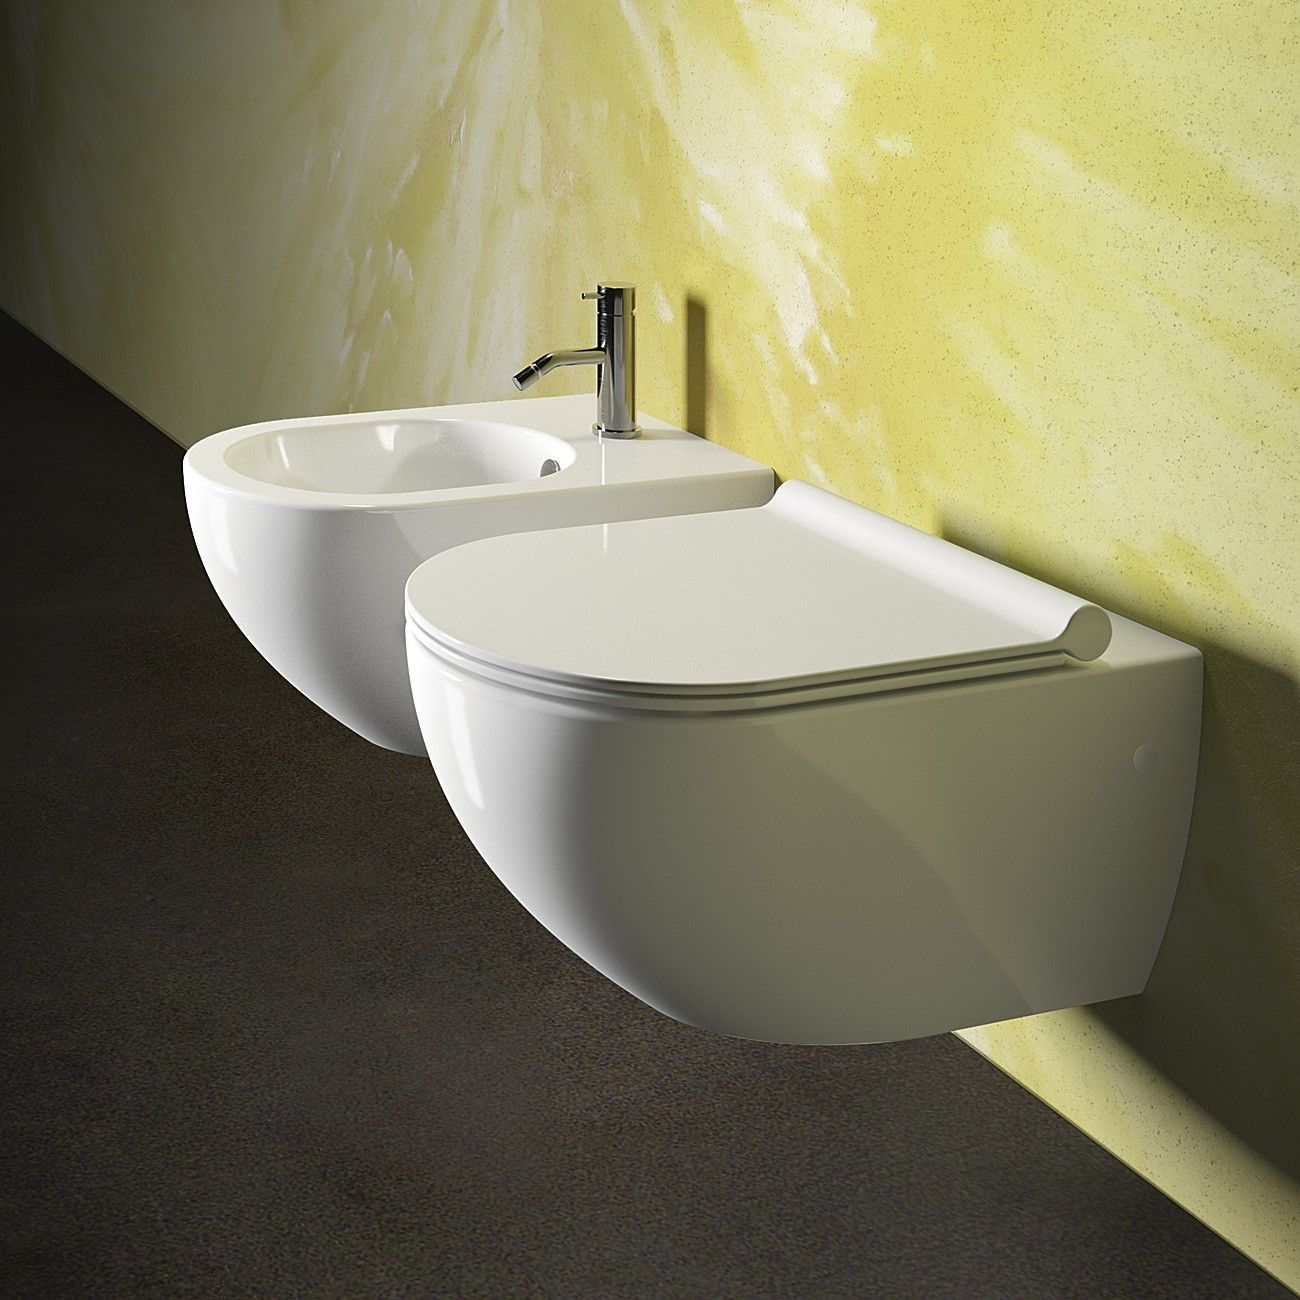 catalano sfera wall hung toilet with slim seat and cistern with  - catalano sfera wall hung toilet with slim seat and cistern with button rogerseller